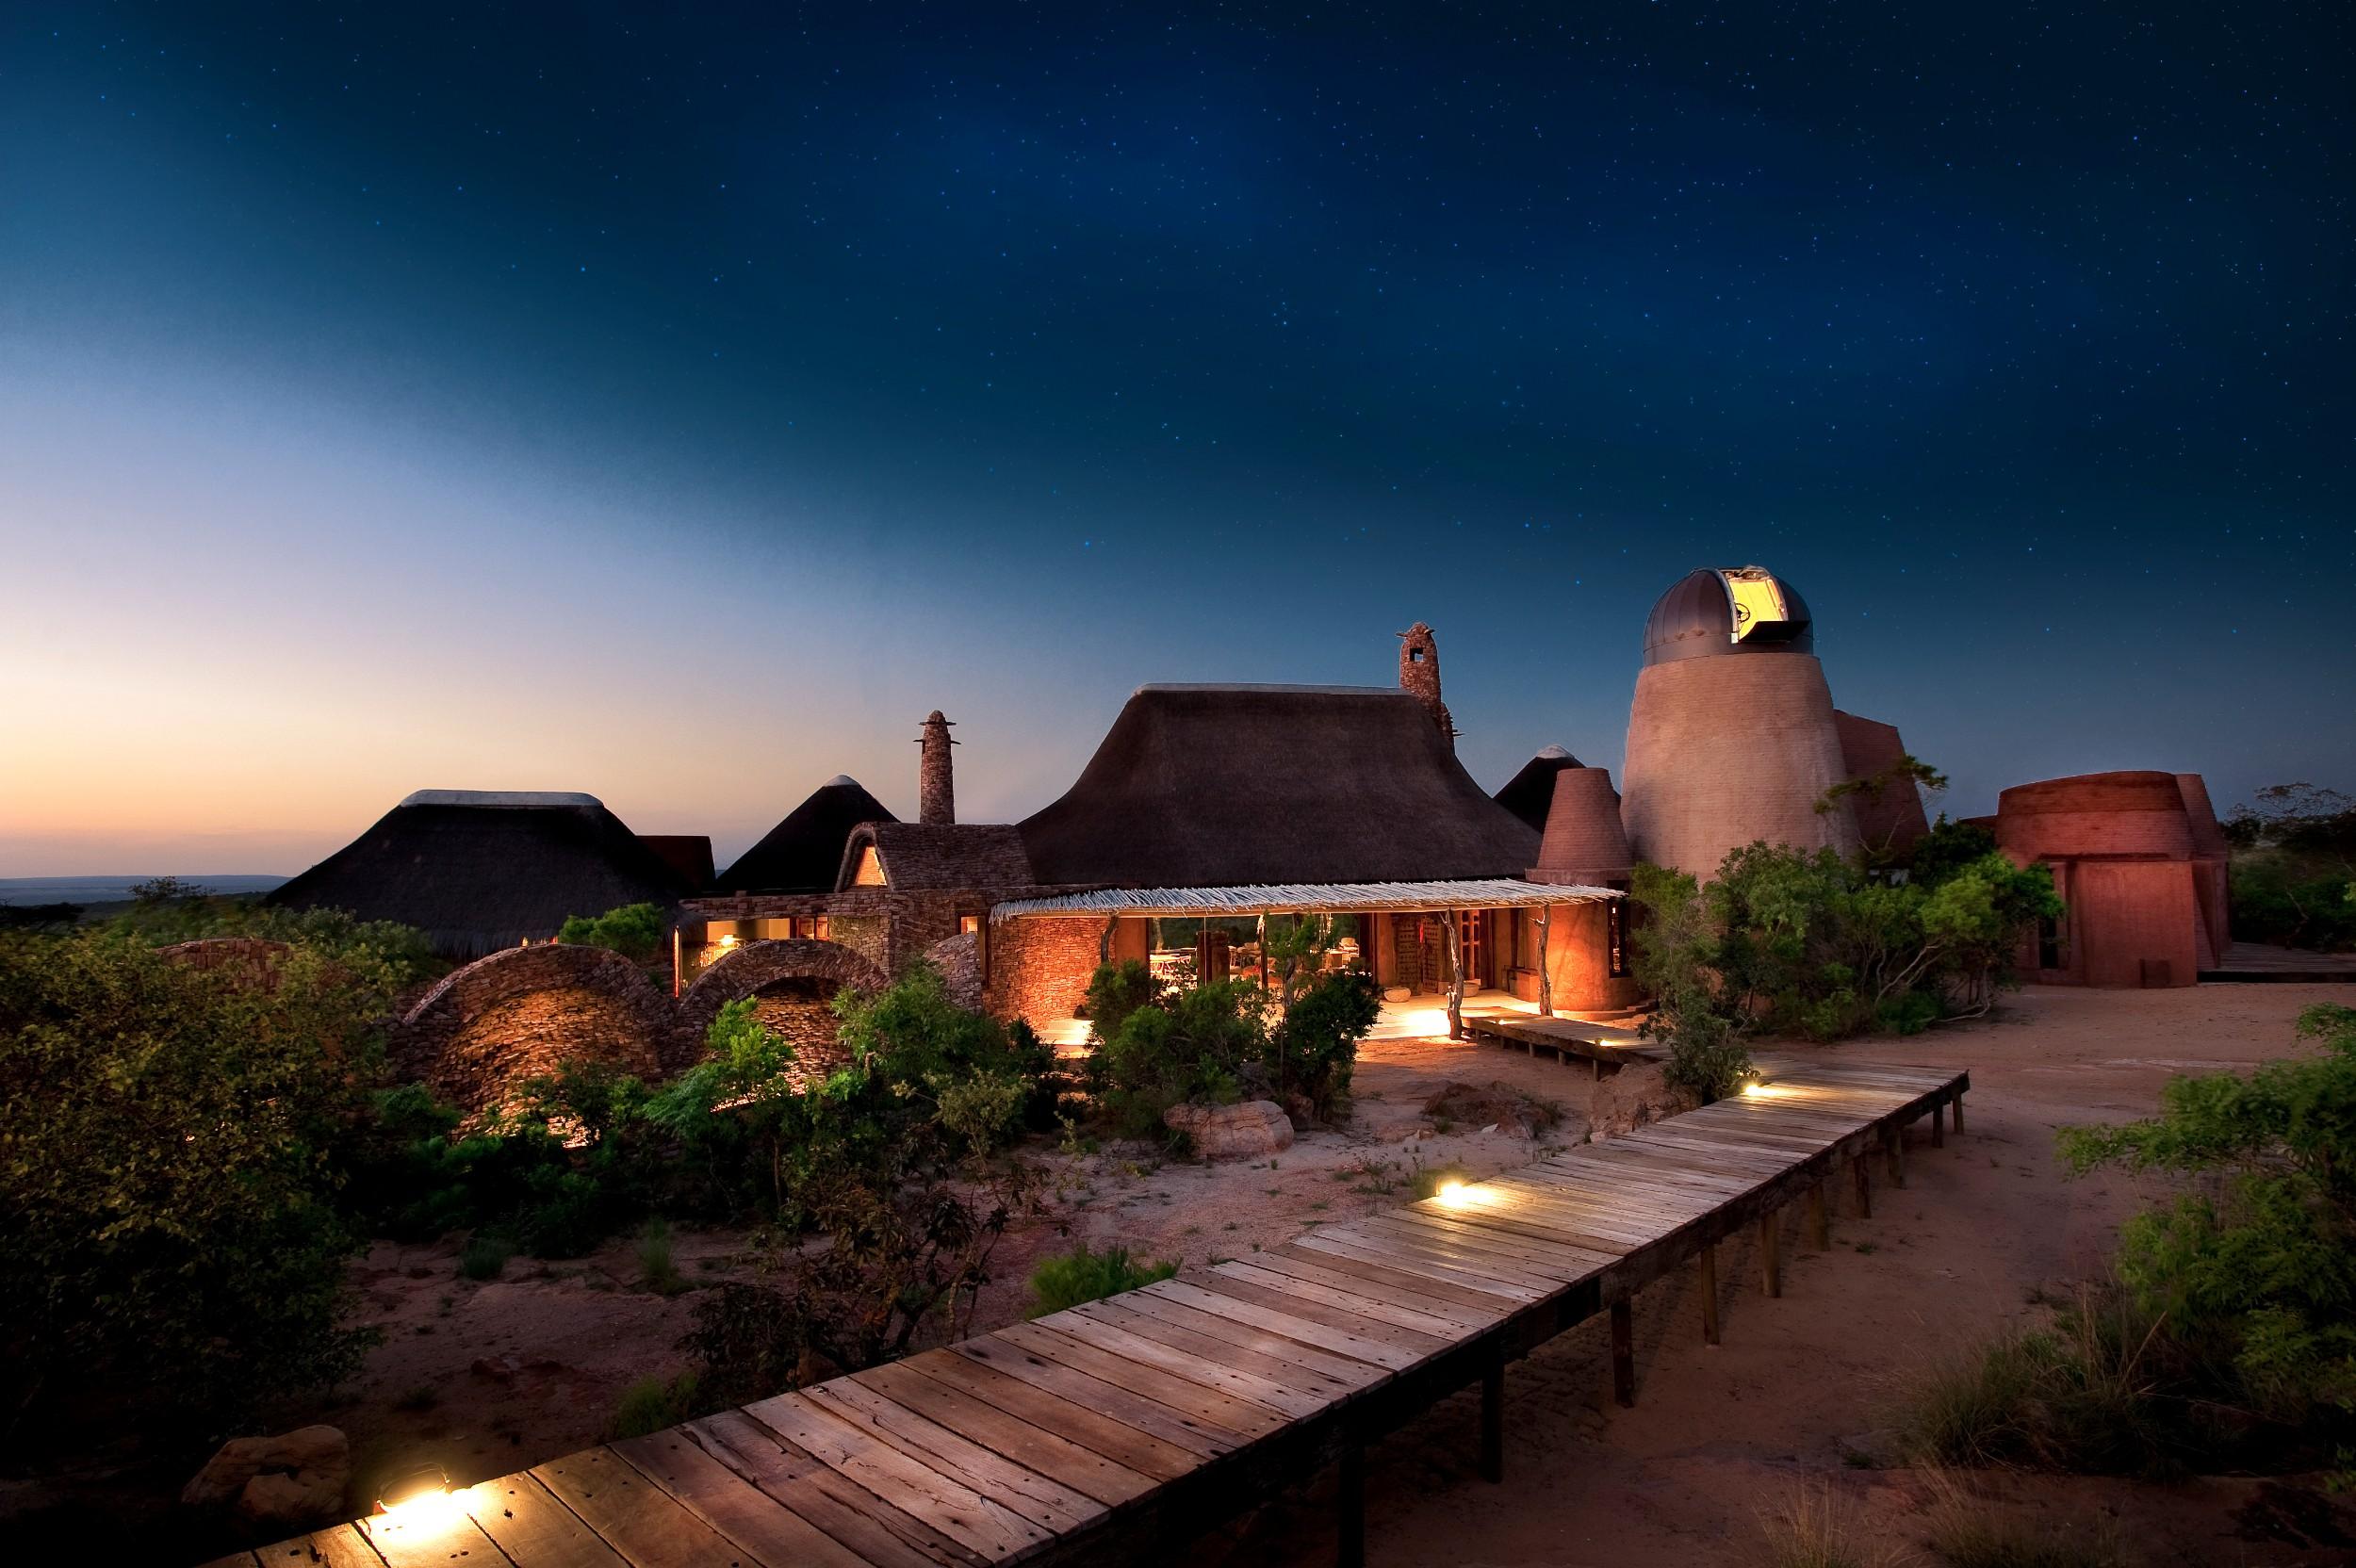 House - Night observatory dook 44.jpg